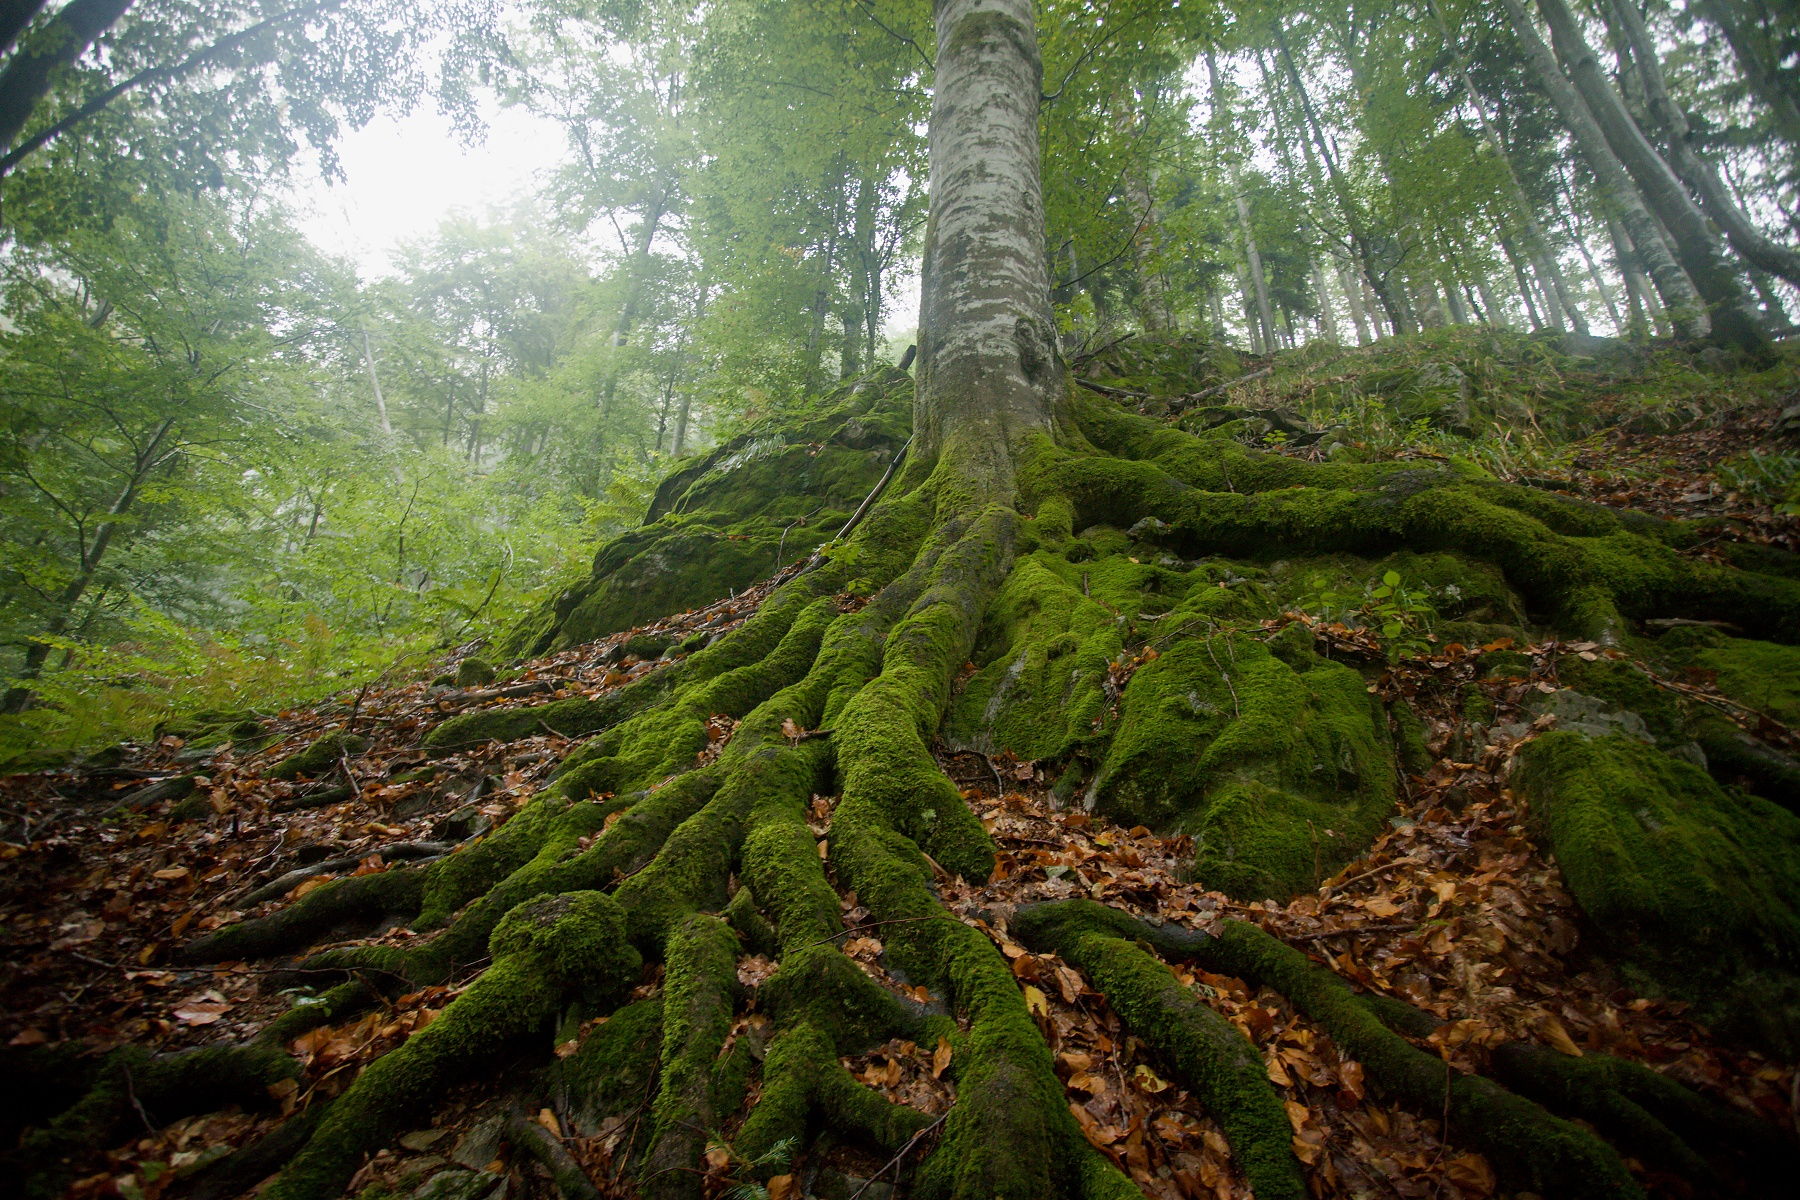 Criva valley, Munții Maramureșului, Romania Canon EOS 6d mark II + Canon 17-40mm, 17mm, 1/13, f4, ISO 2000, 29. september 2020